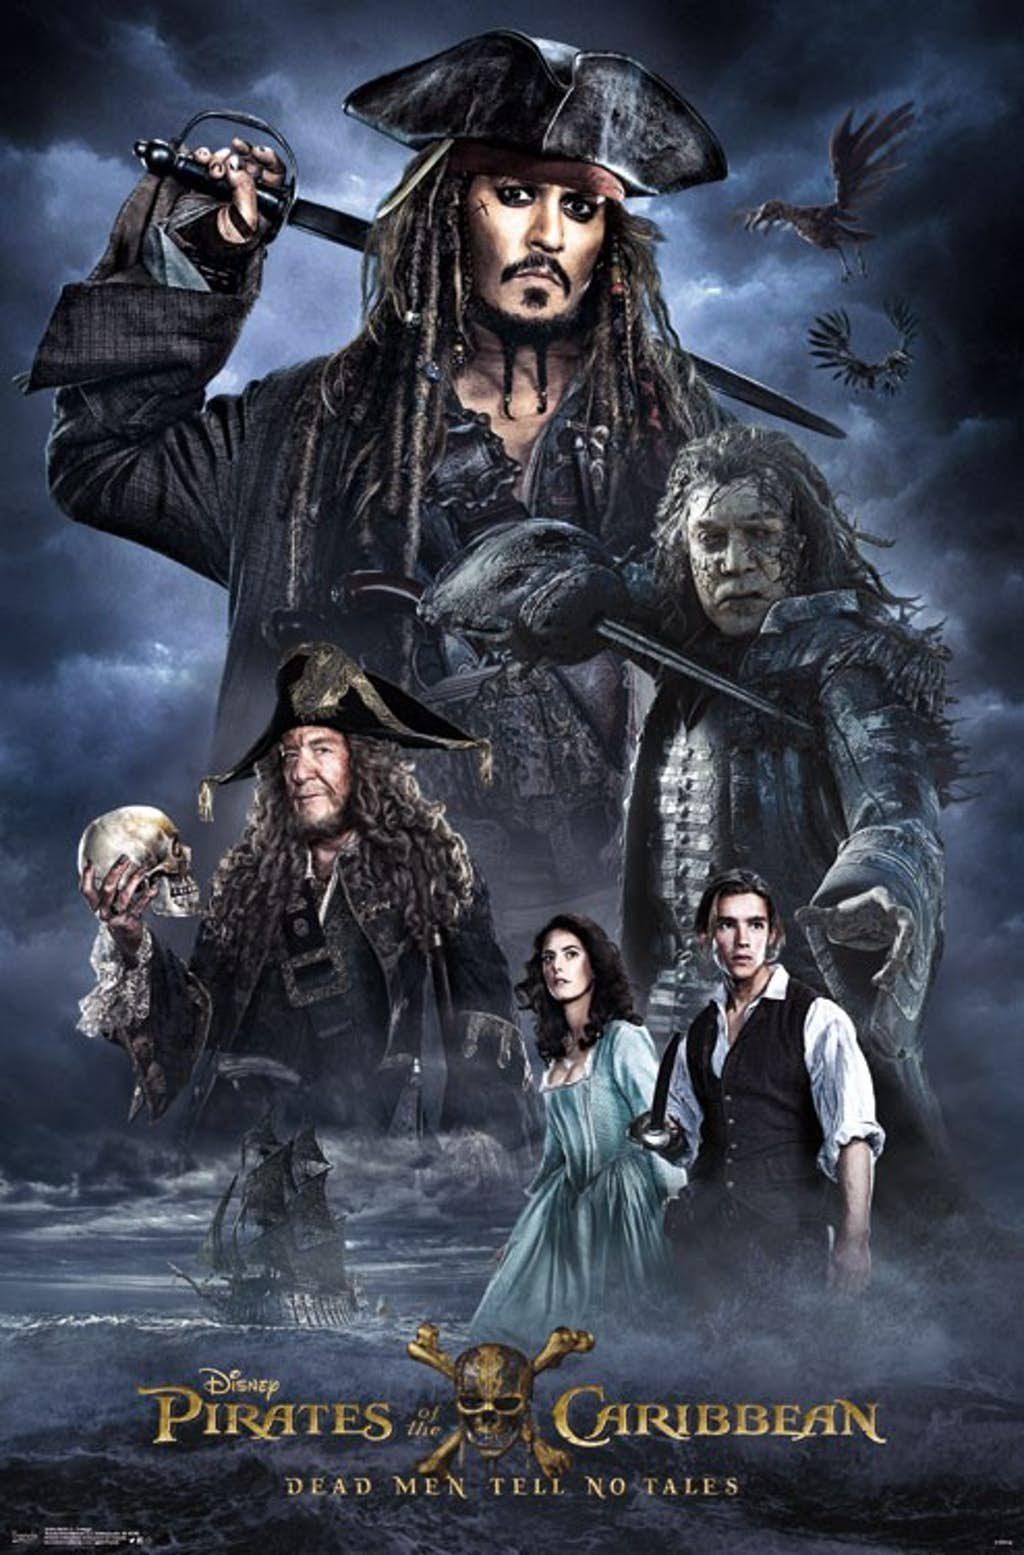 Jack Sparrow, Javier Bardem, Hector Barbossa, Carina Smith y Henry